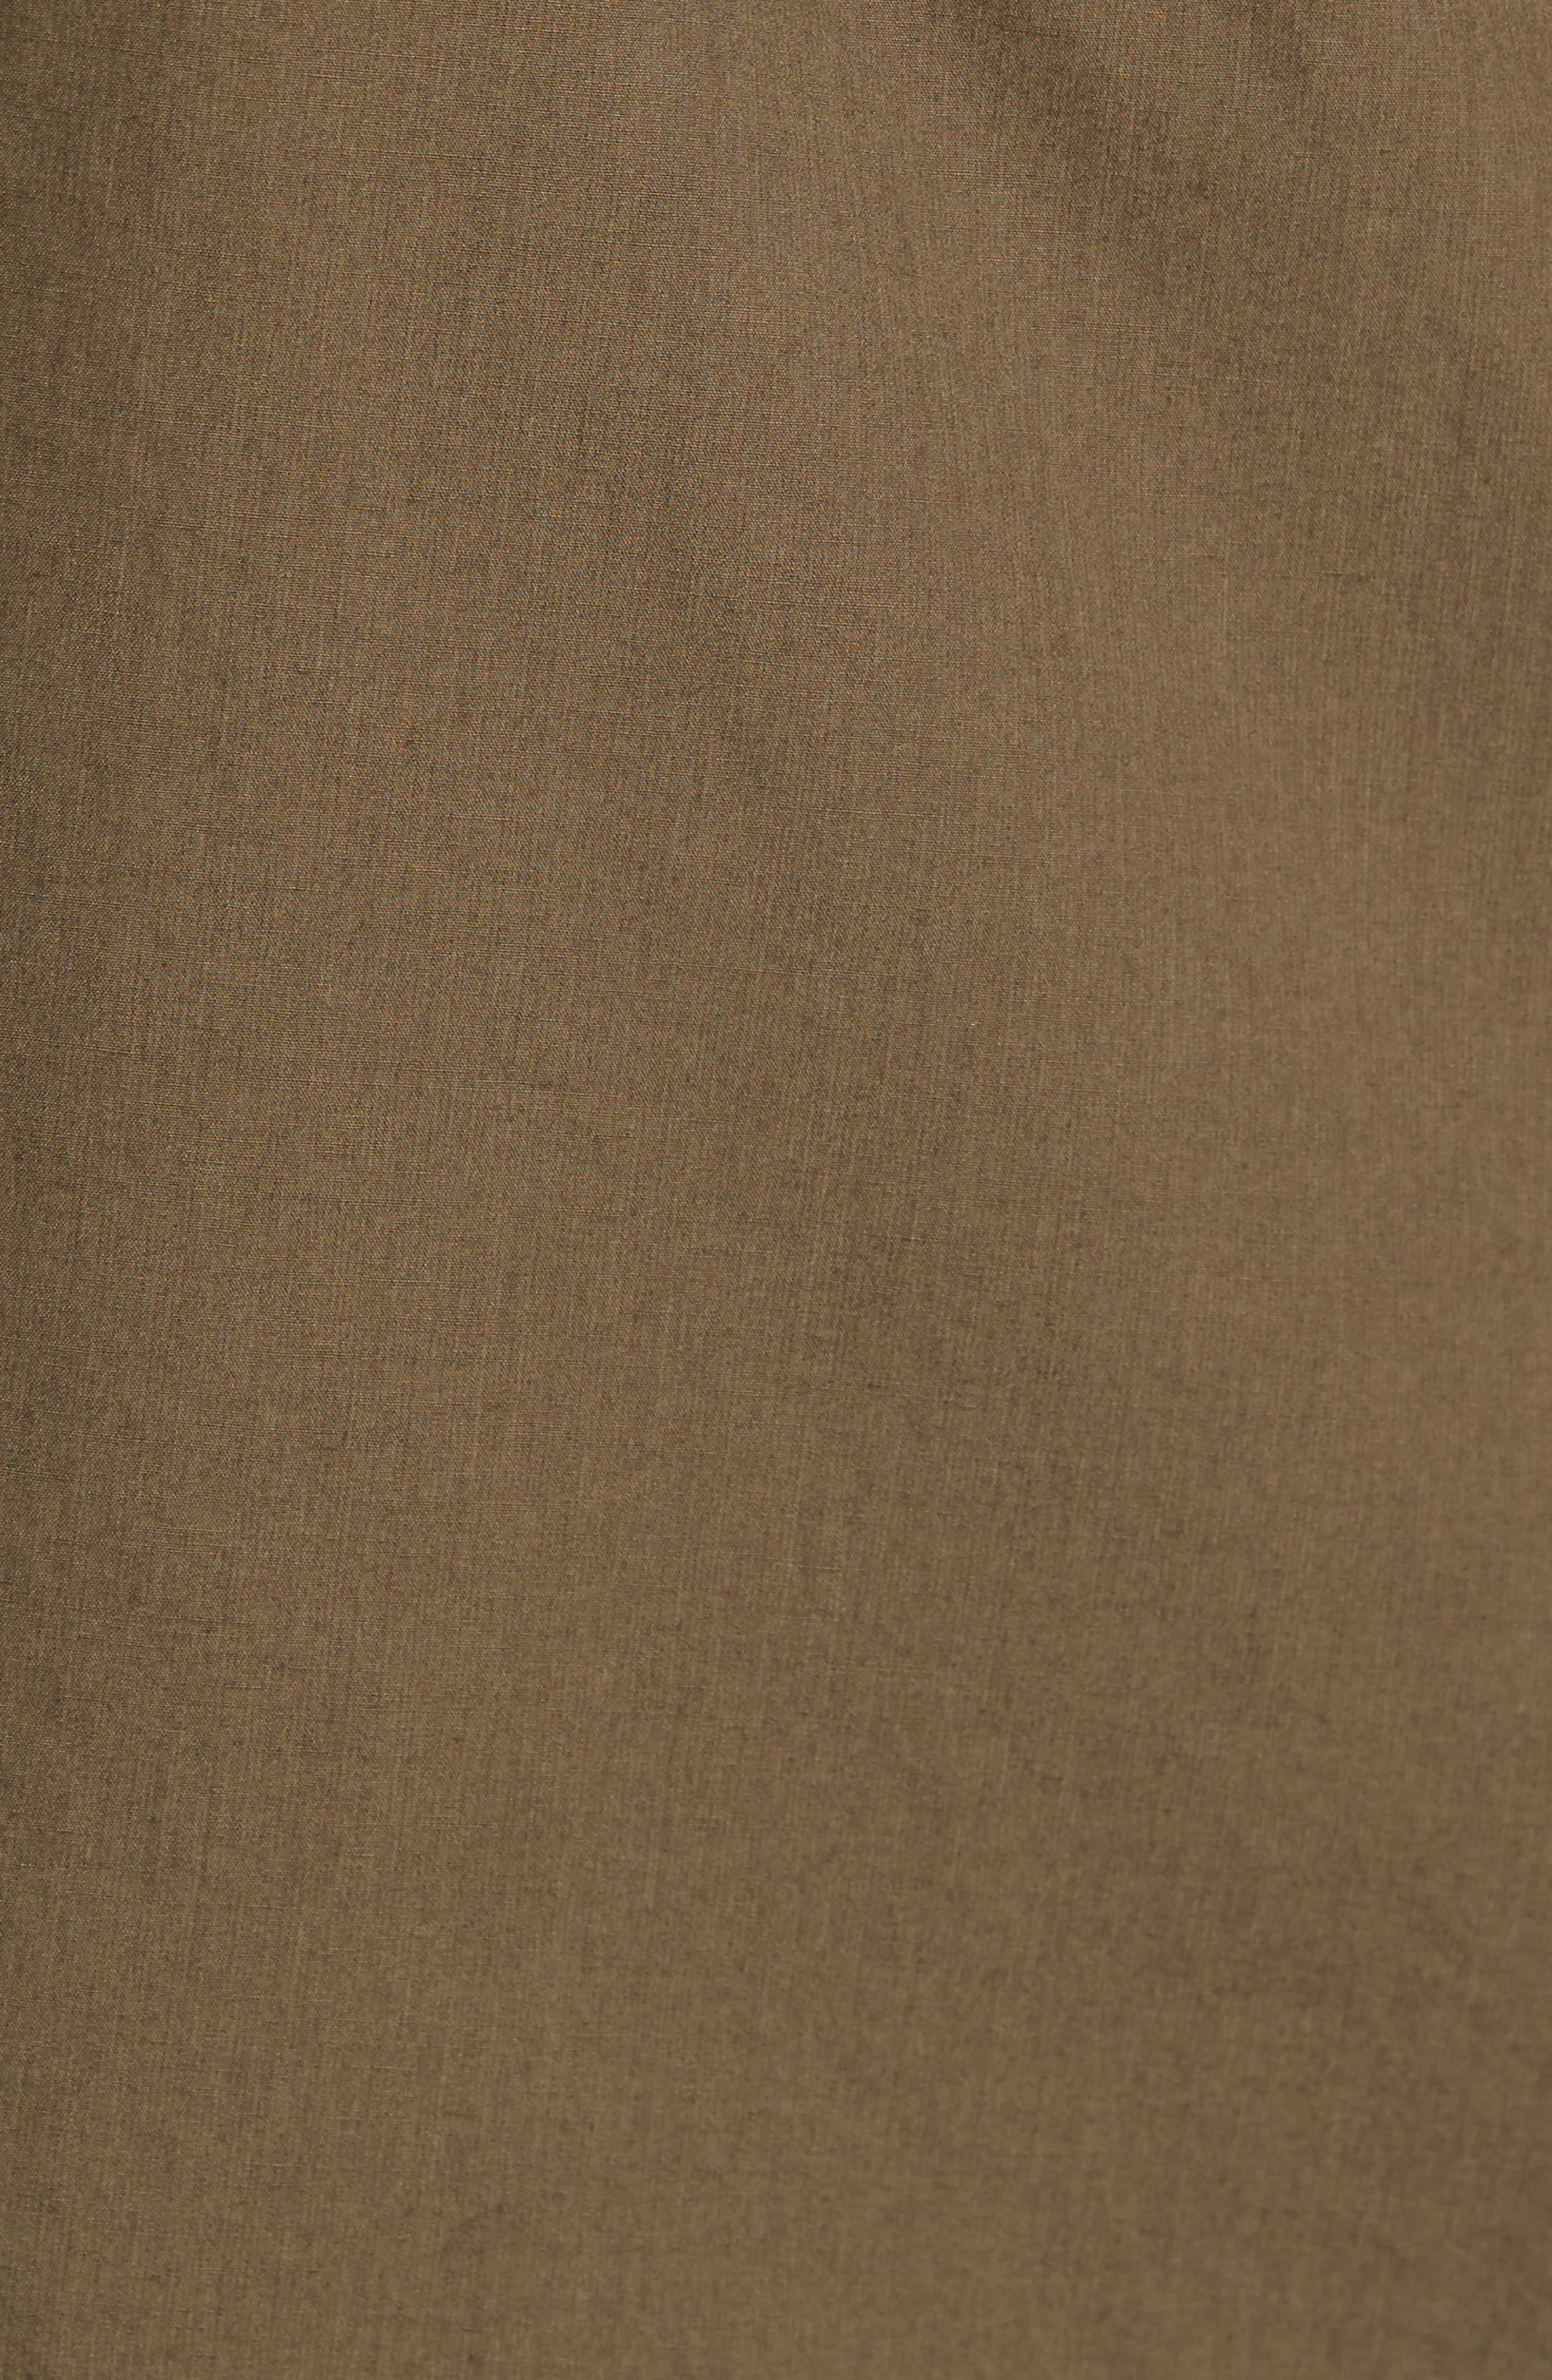 Iggy M65 Jacket,                             Alternate thumbnail 6, color,                             304